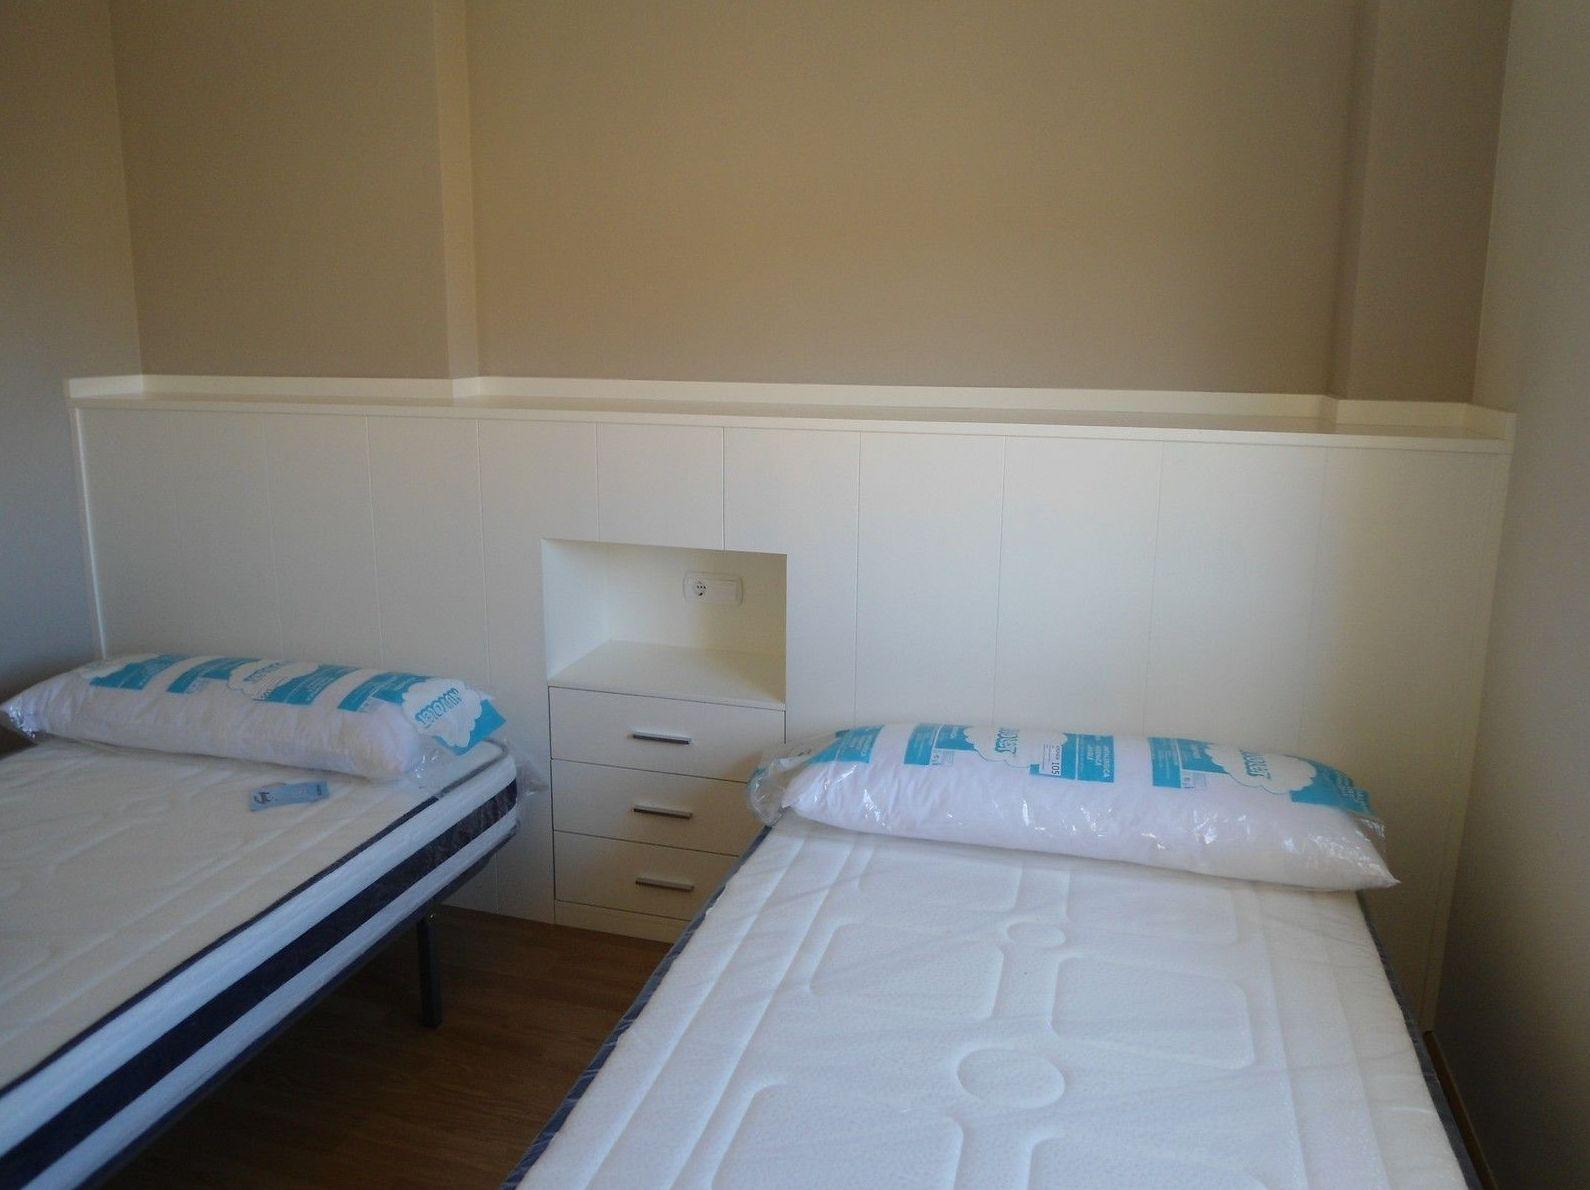 Cabecero de cama con mesita integrada CON MESITA INTEGRADA